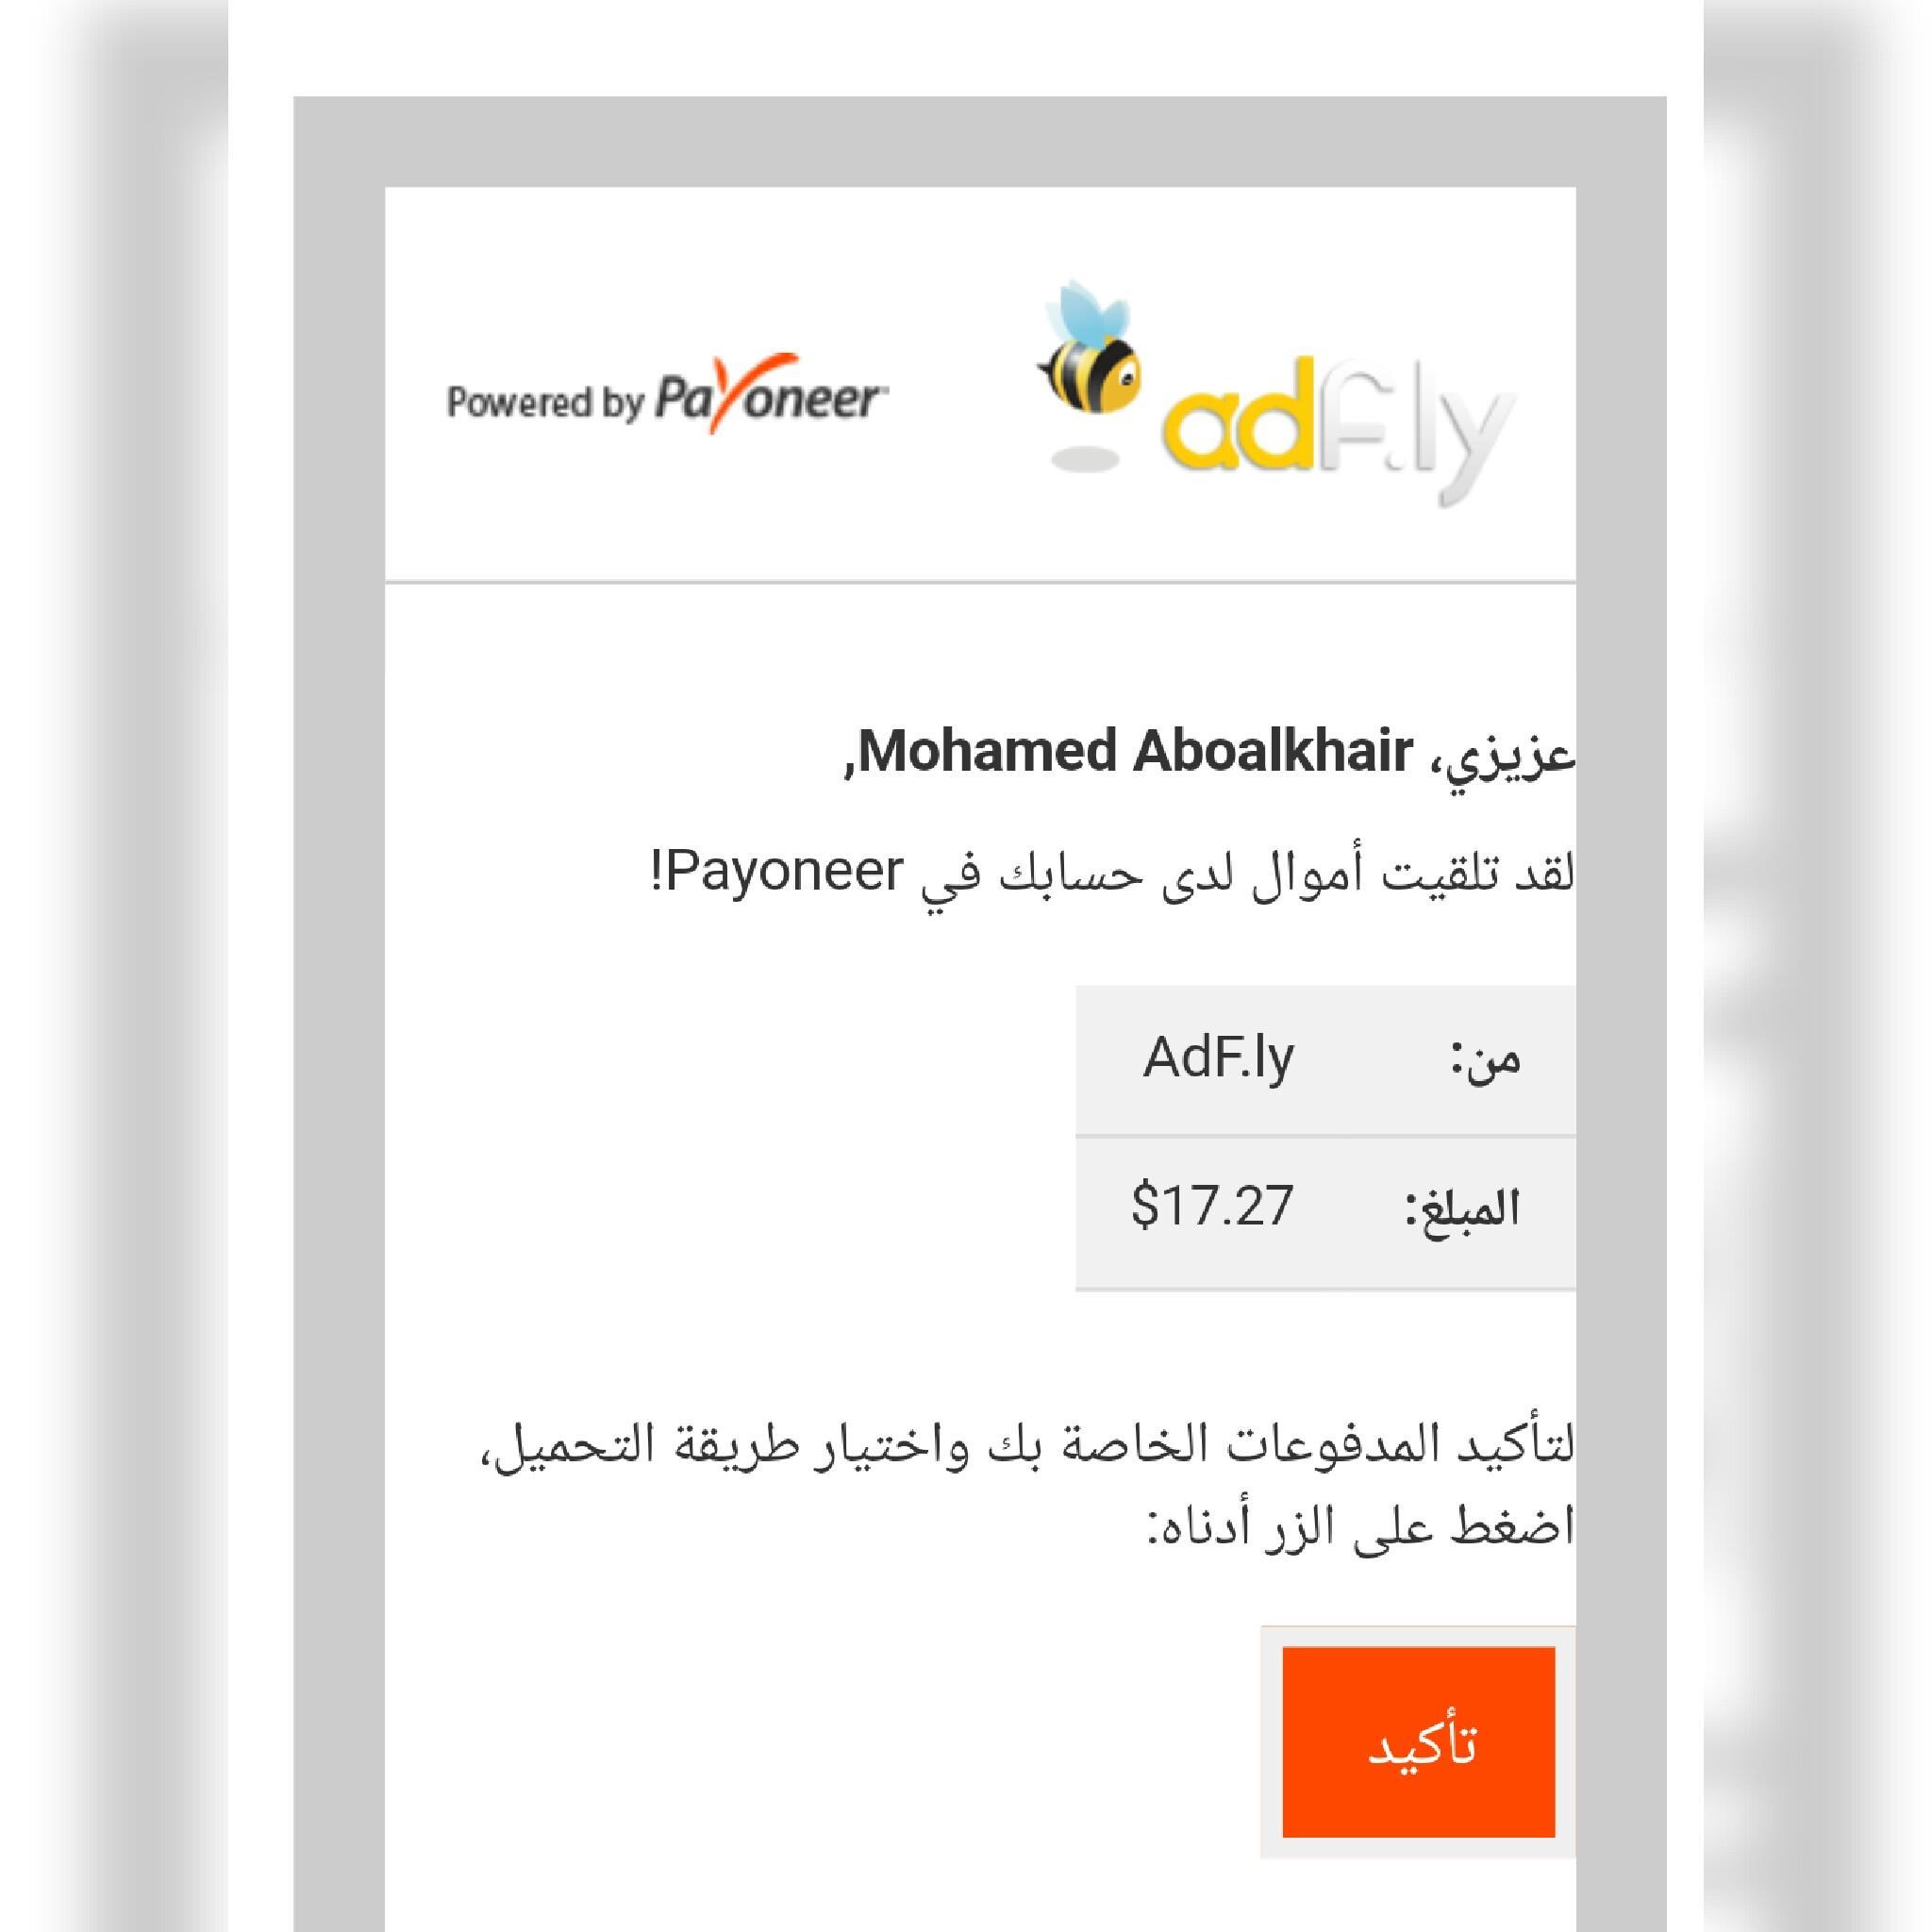 موقع adfly اثبات دفع 17 دولار  326216298